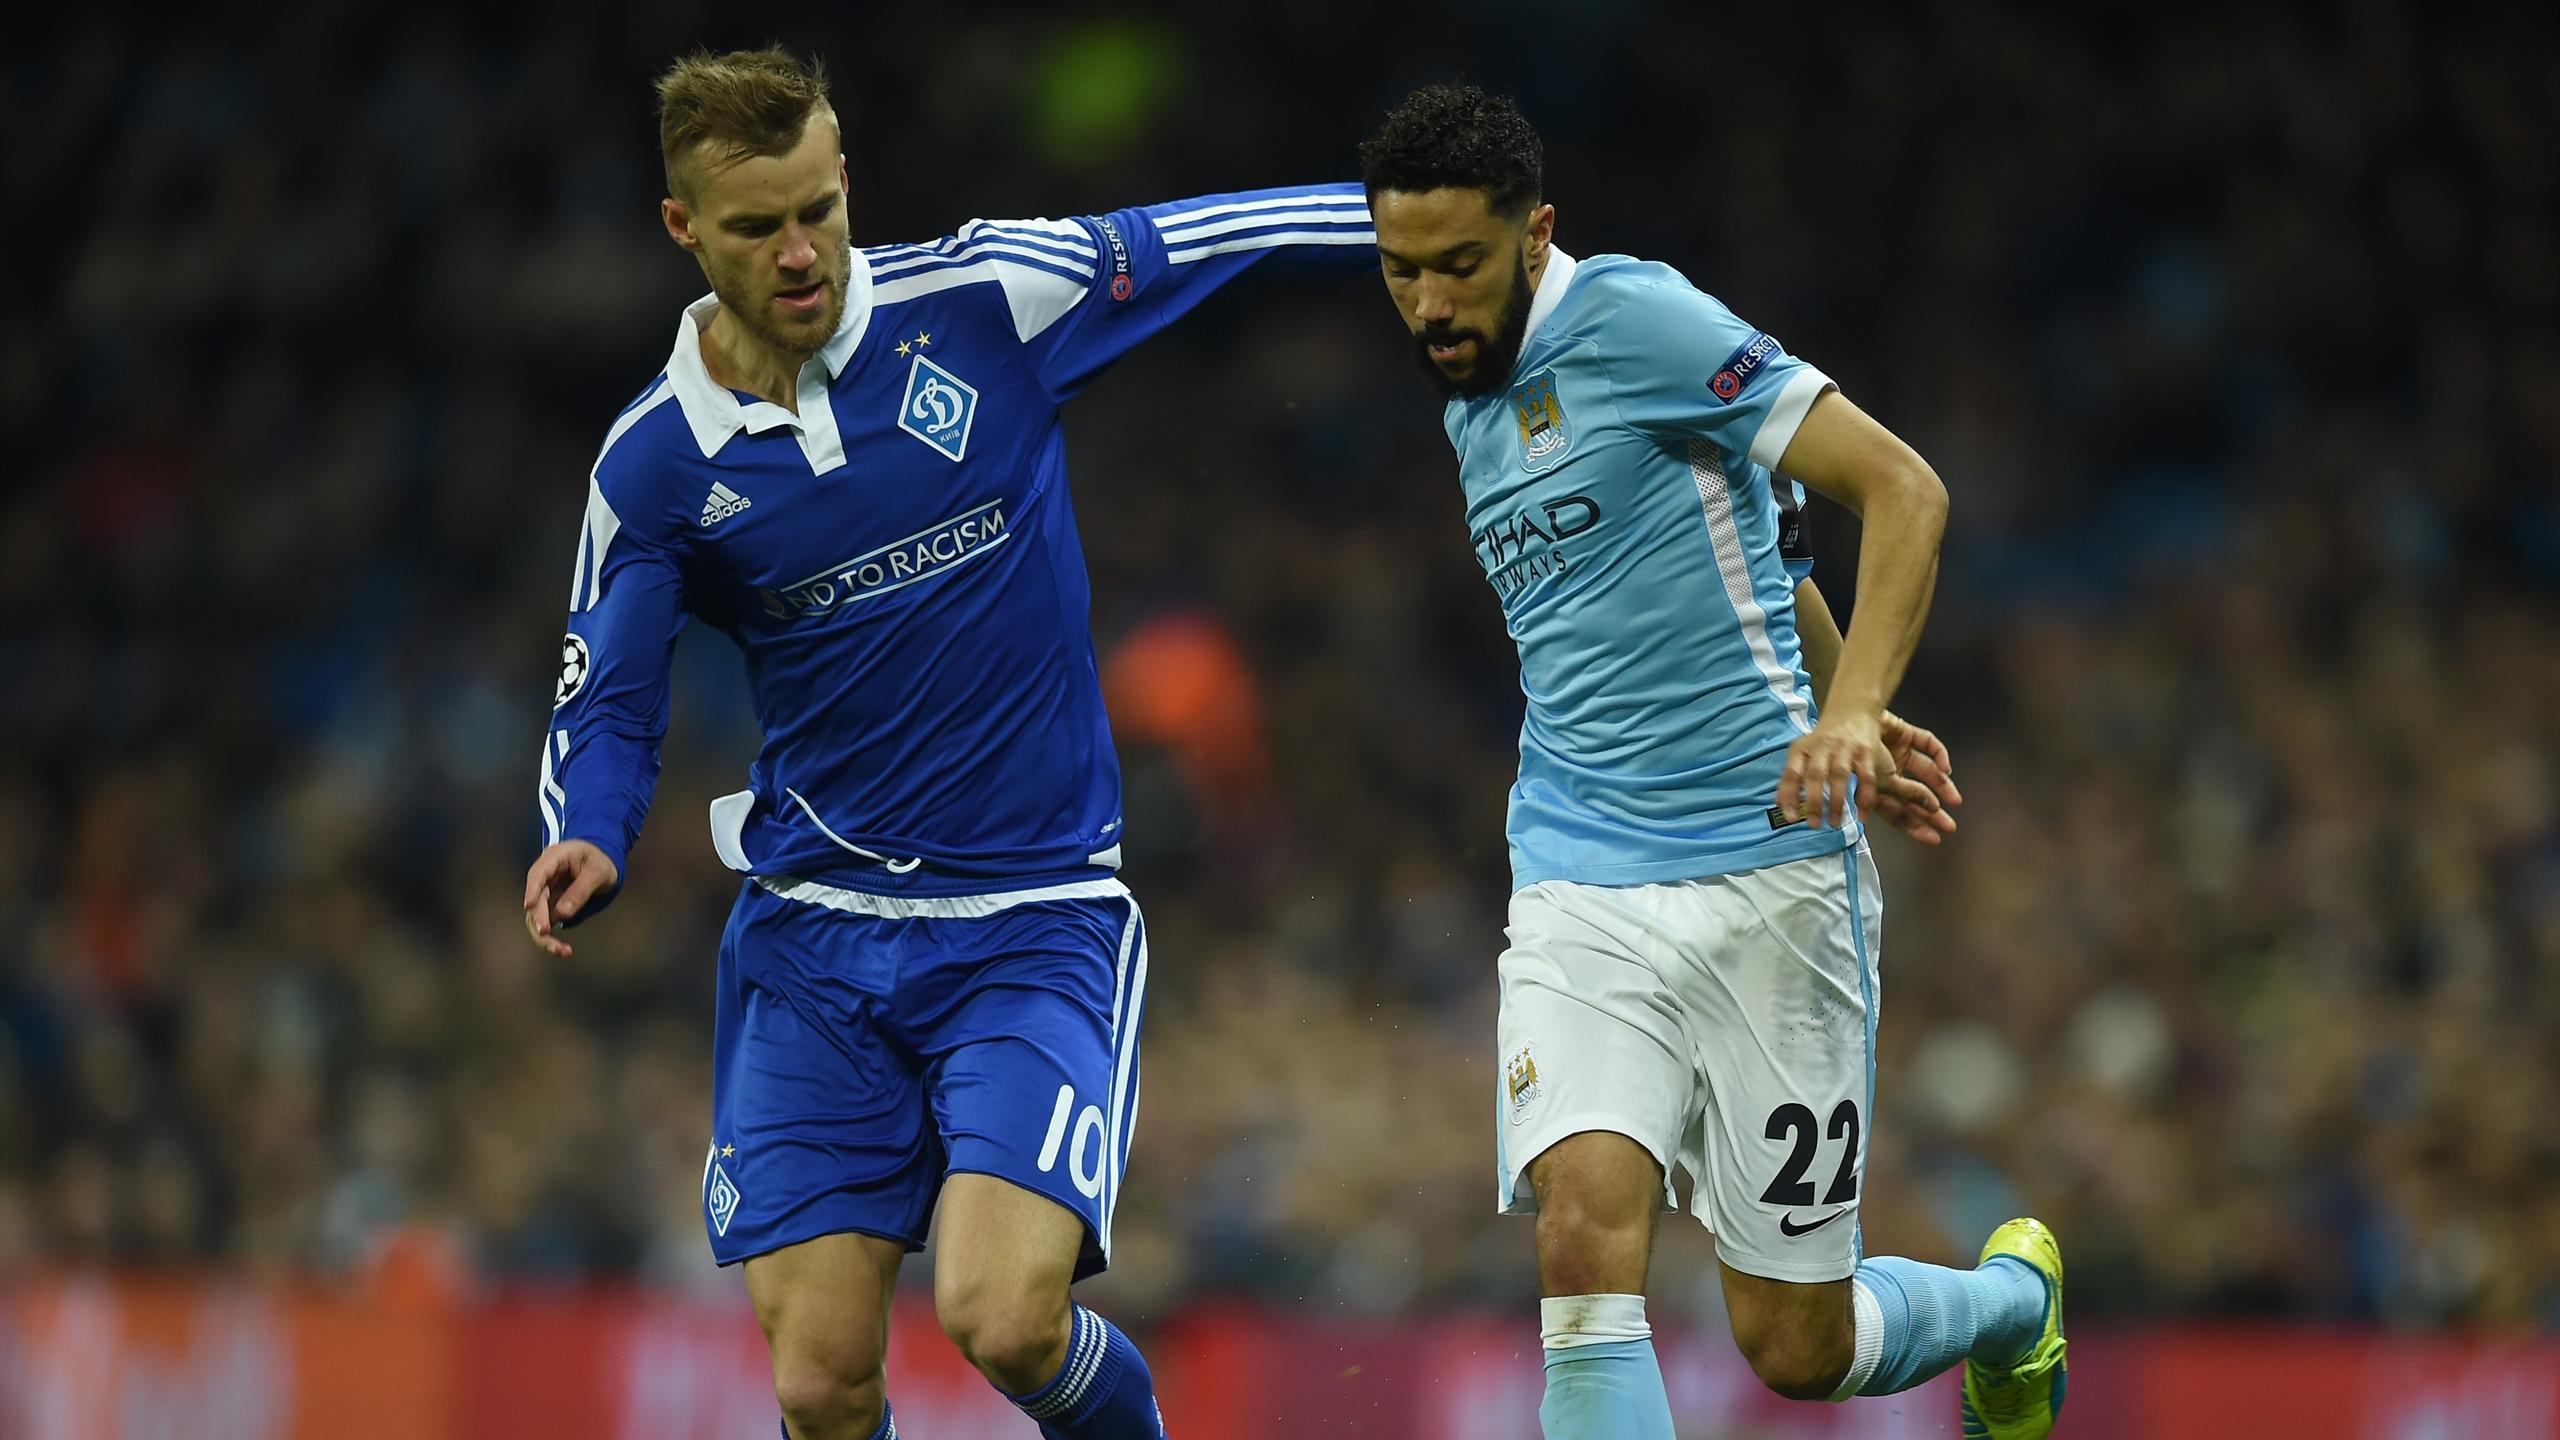 Dynamo Kiev's Ukrainian midfielder Andriy Yarmolenko (L) vies with Manchester City's French defender Gael Clichy